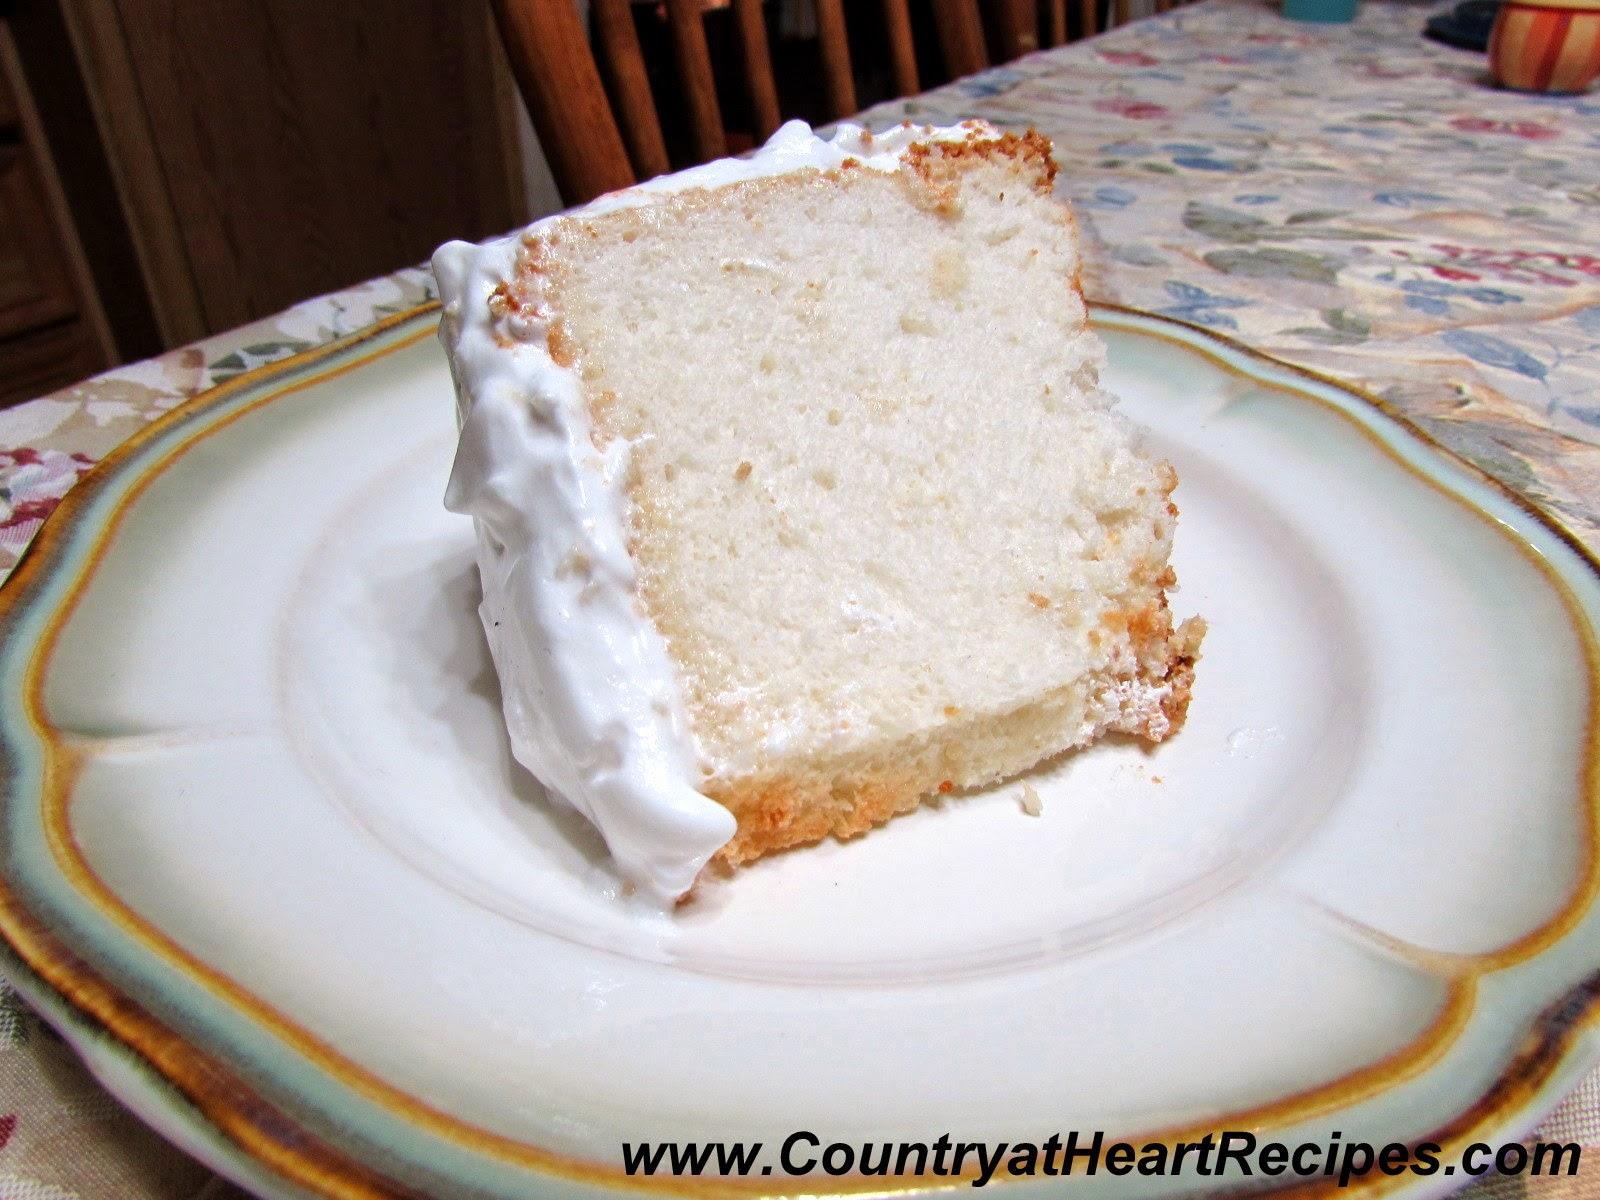 фото с торт пища ангелов рецепт